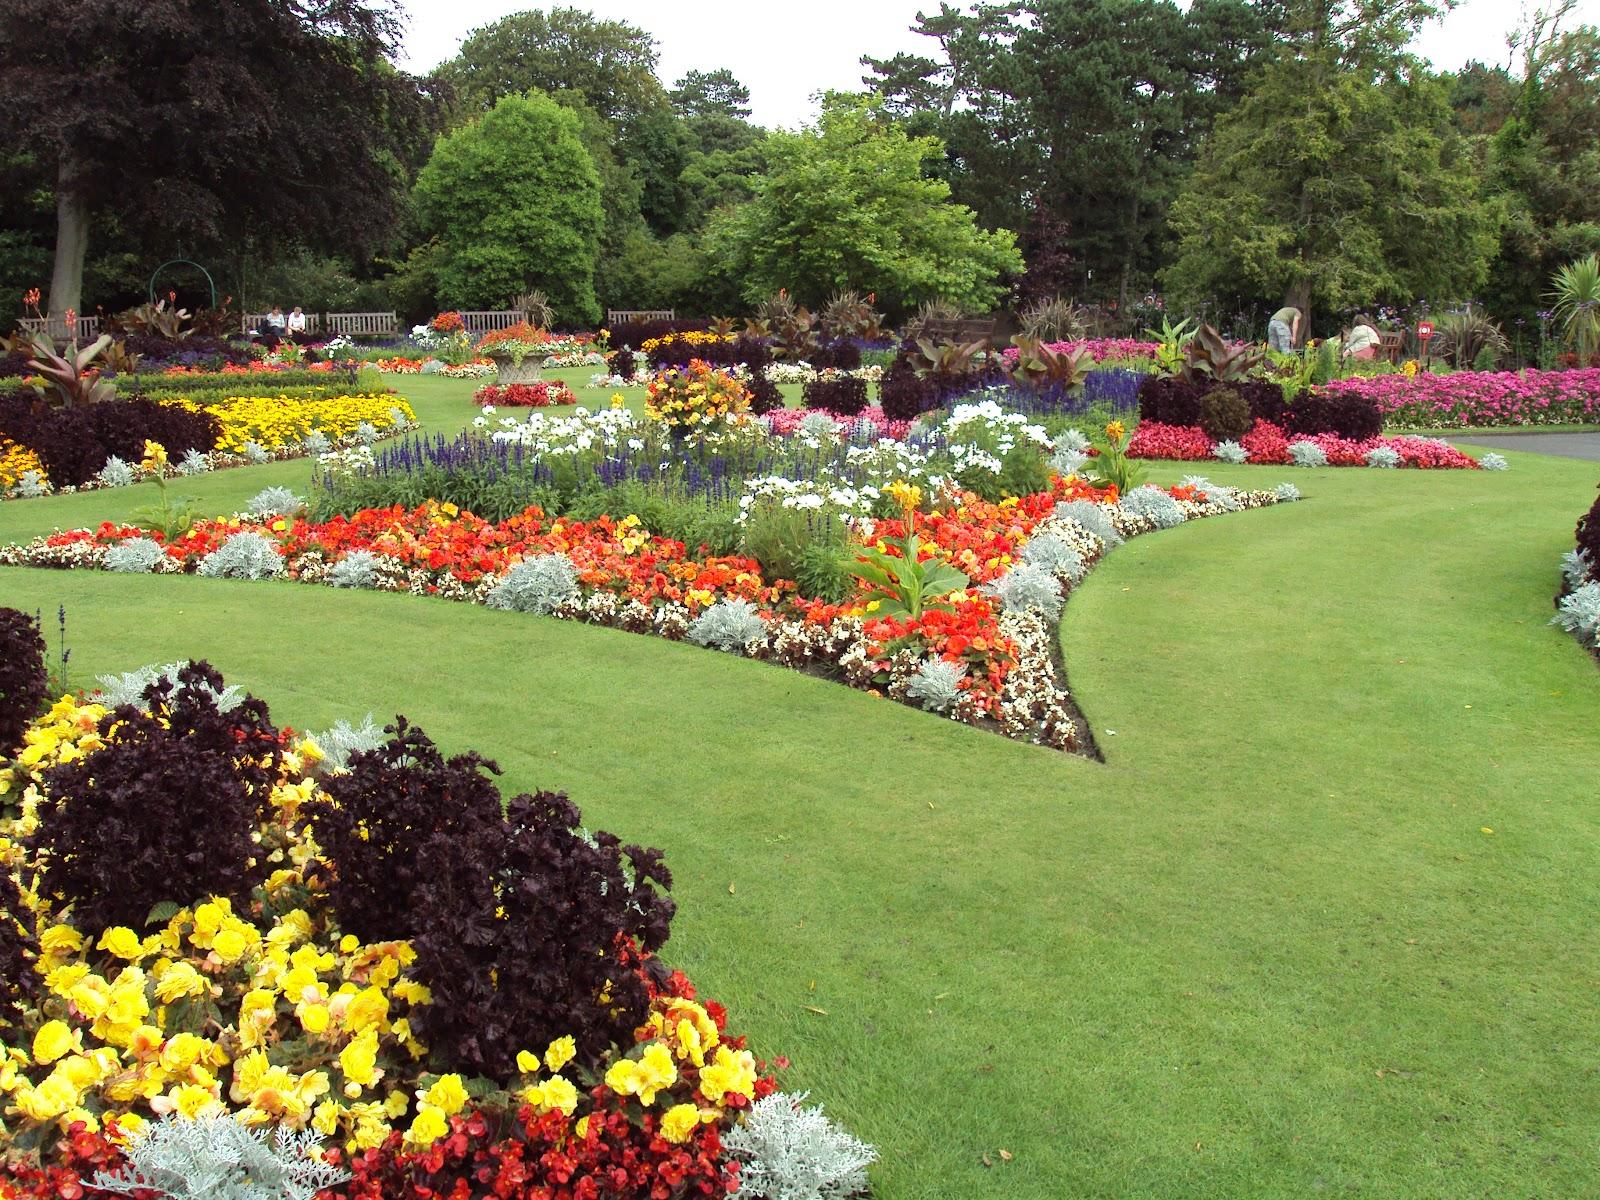 flowers for flower lovers.: Flowers gardens designs ideas.